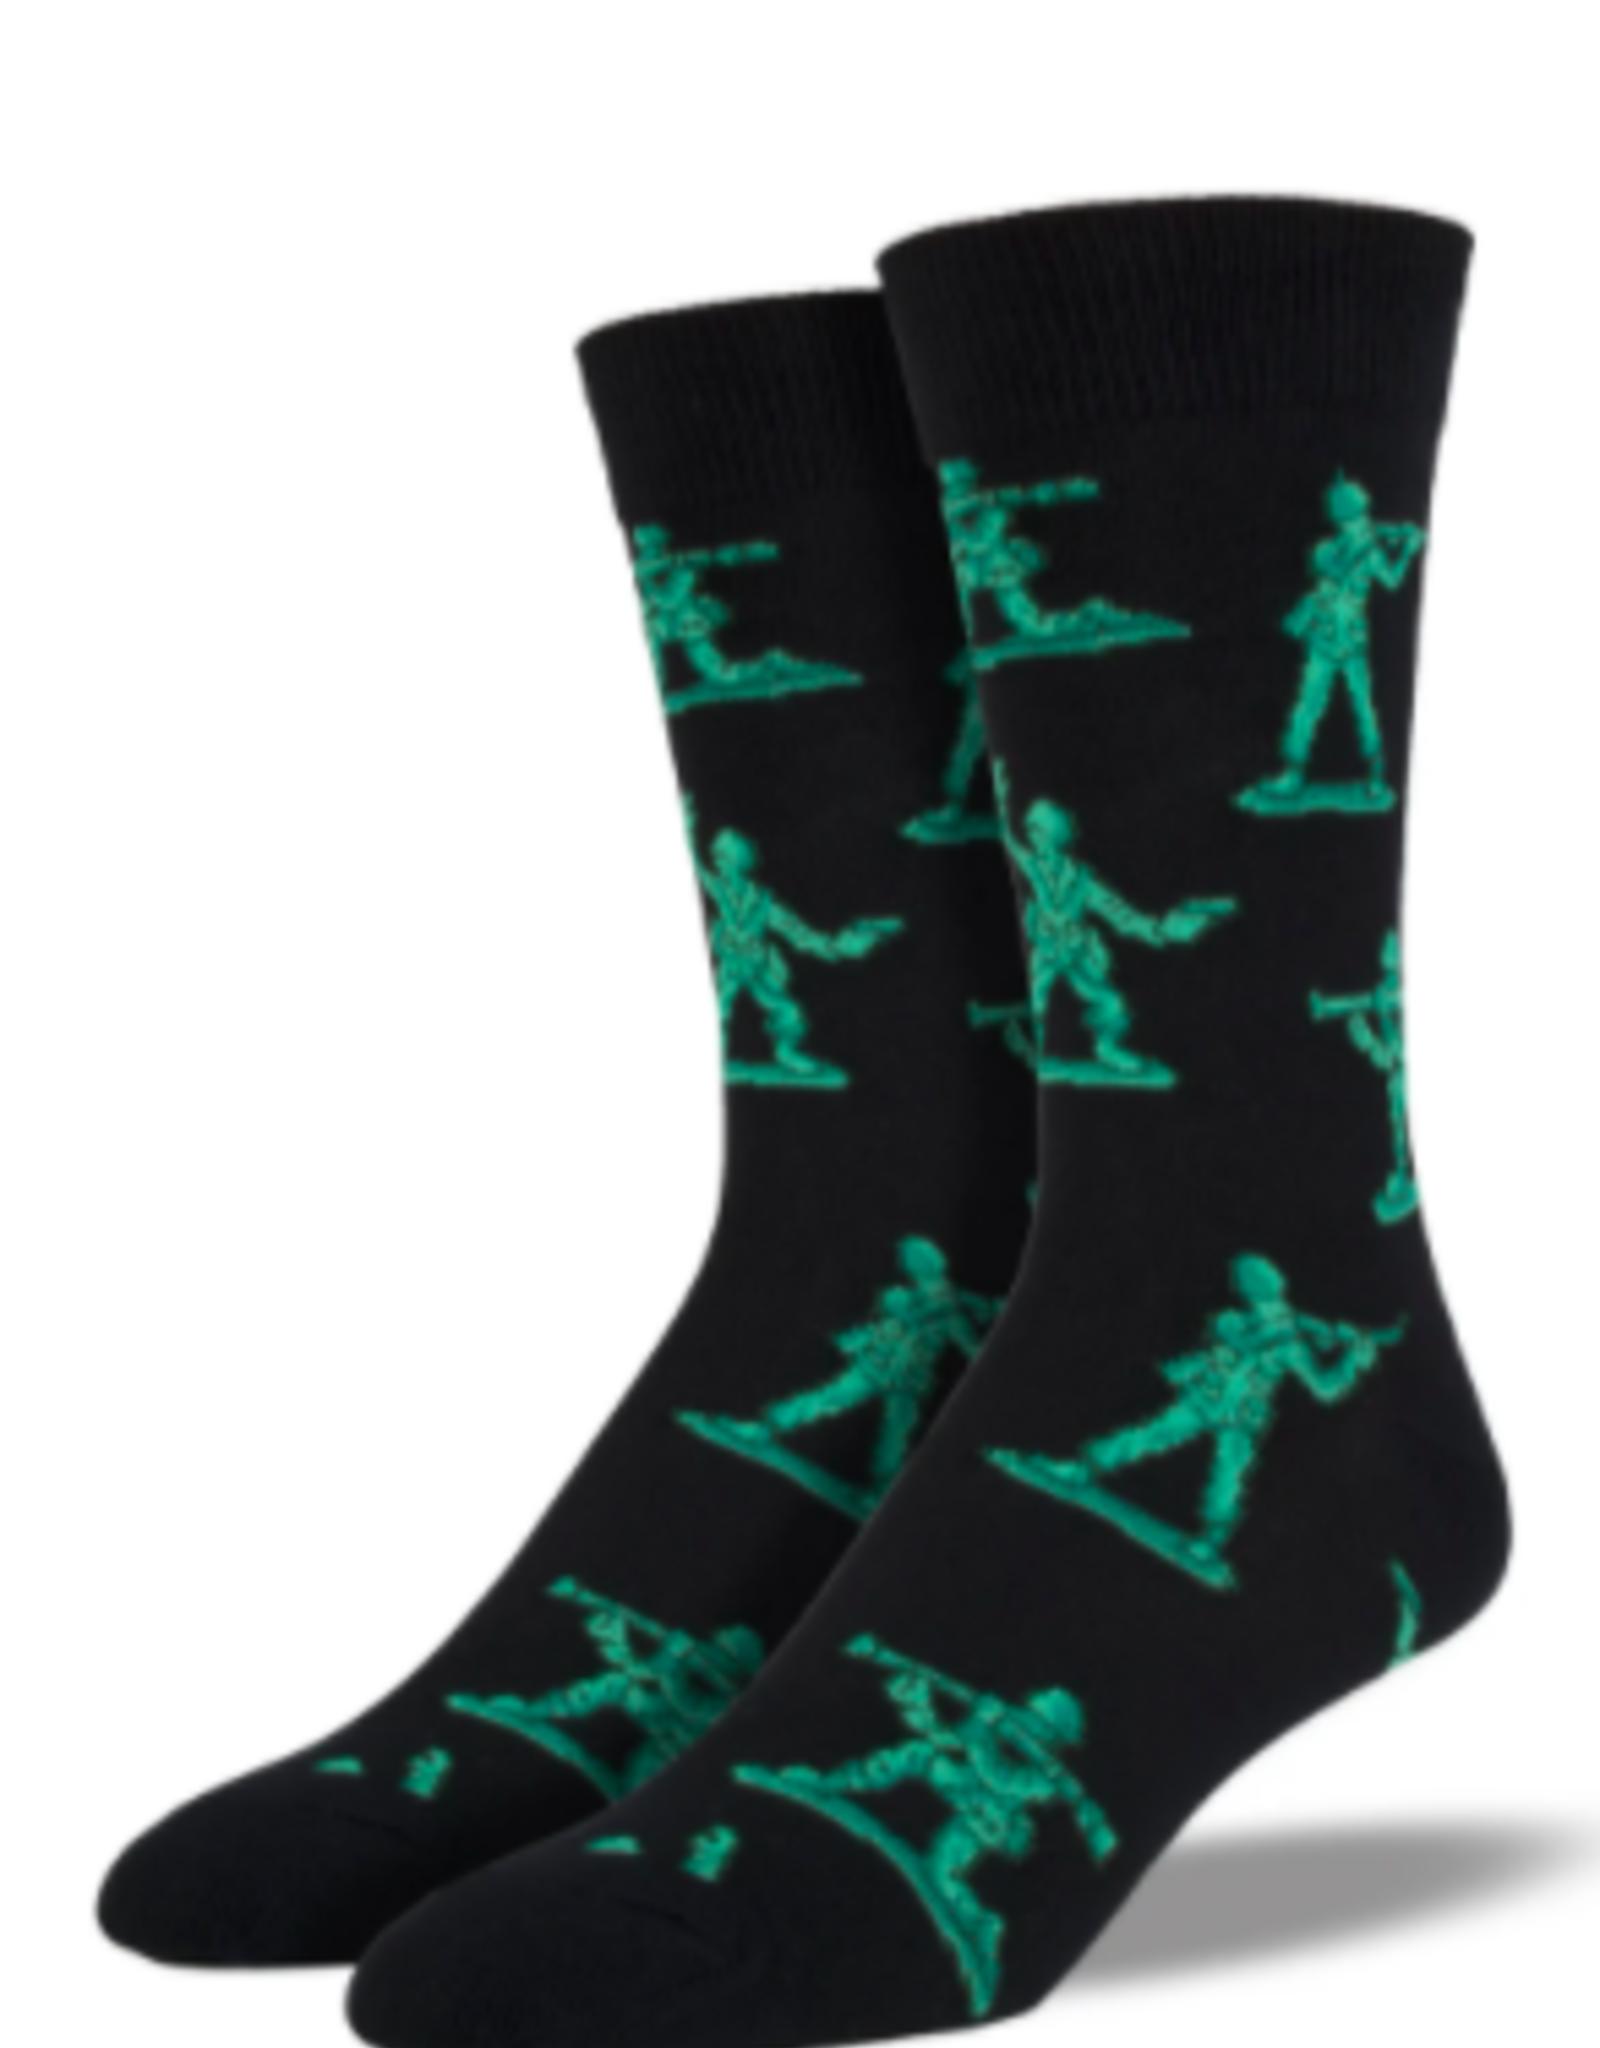 Good Luck Sock Toy Soldier Socks